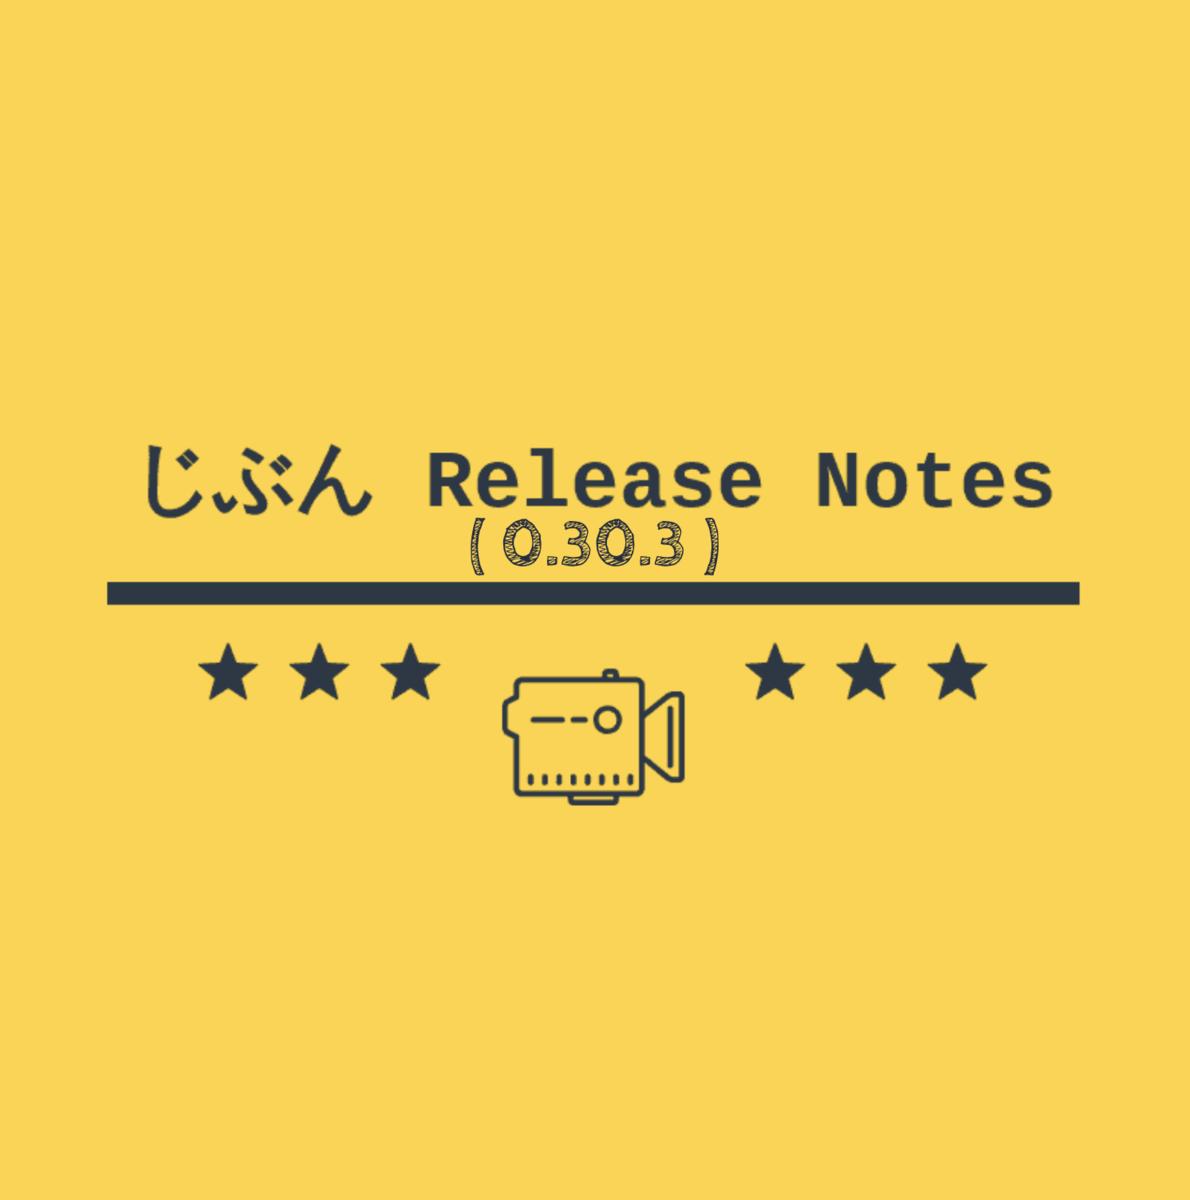 f:id:kic-yuuki:20200202082051p:plain